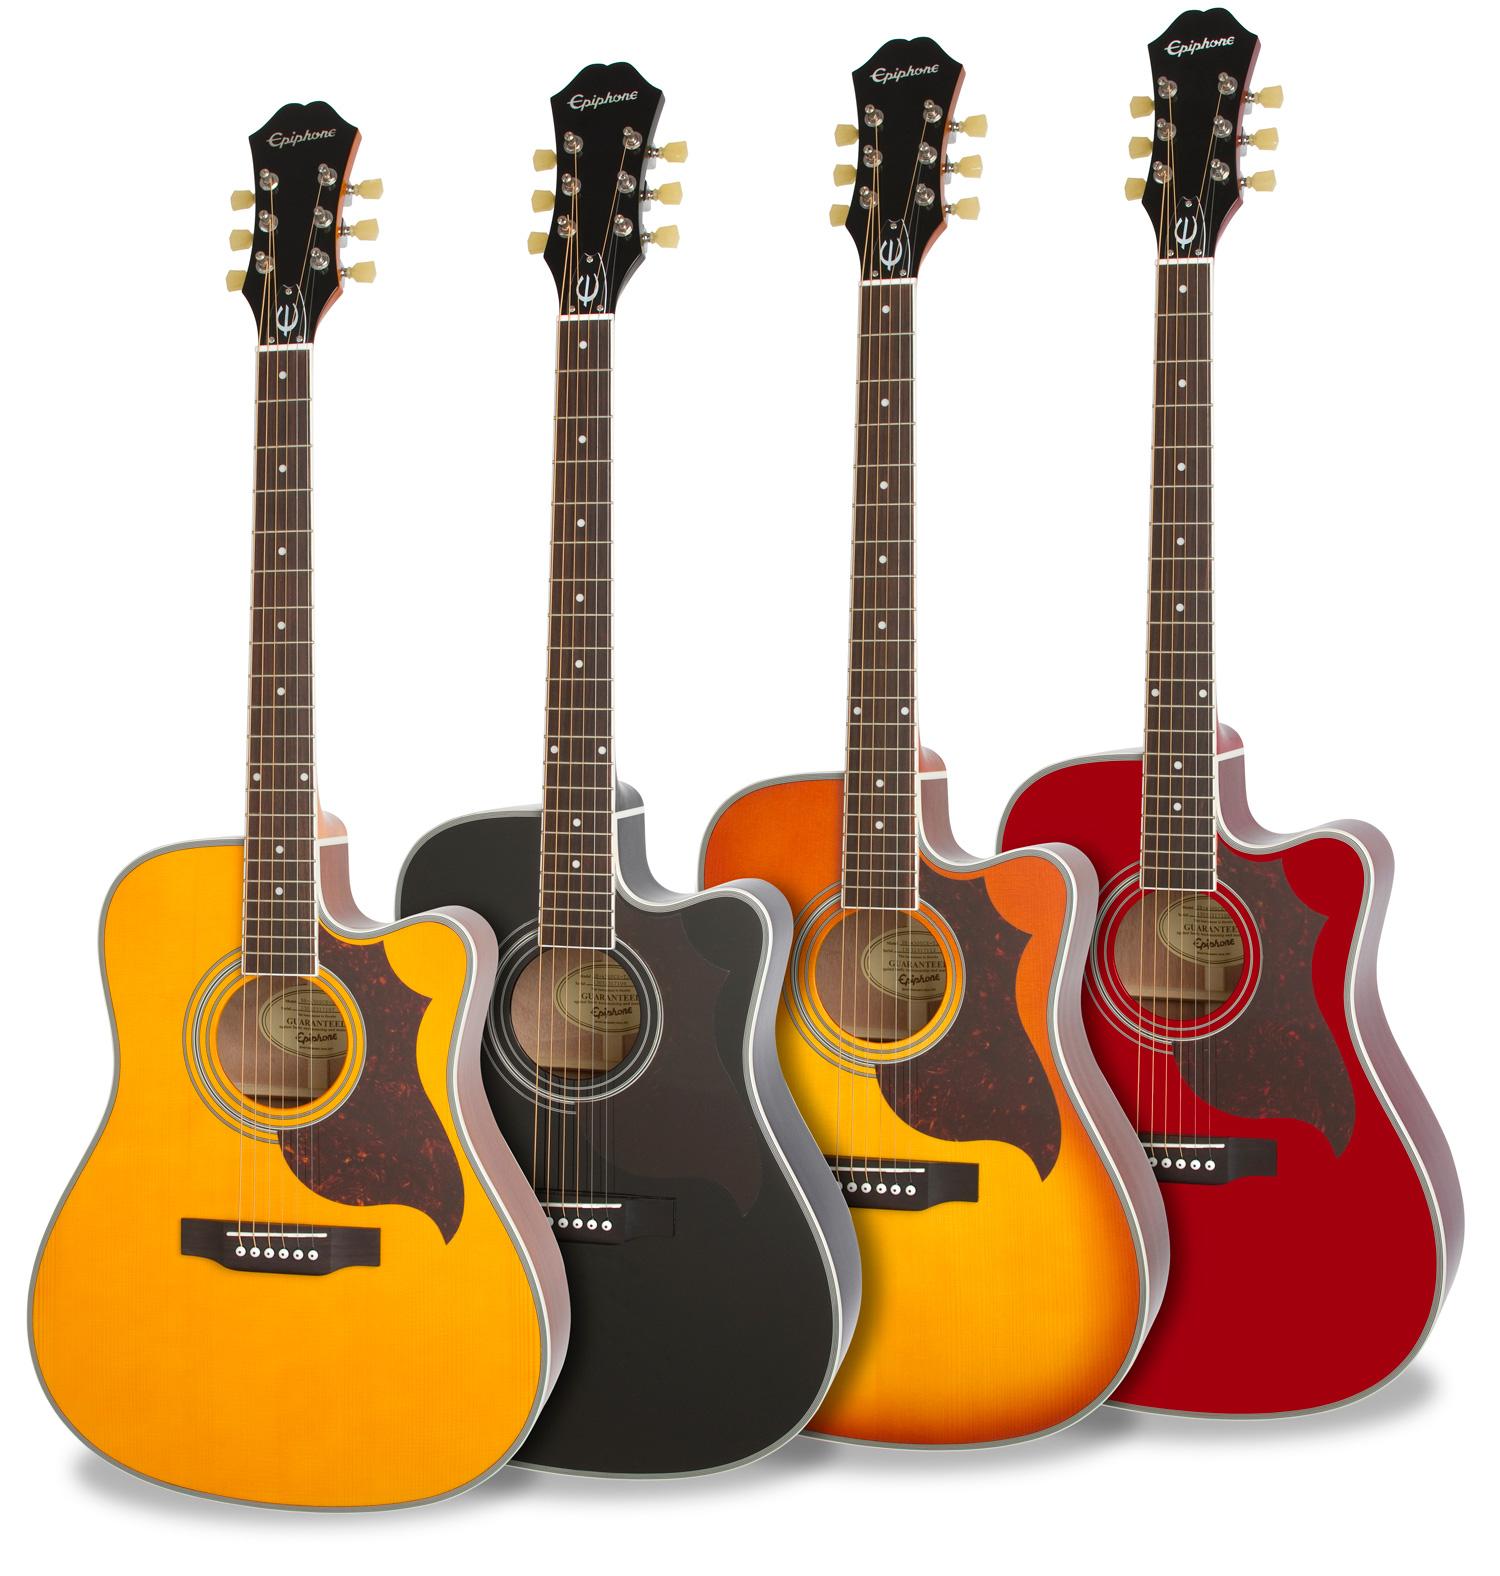 epiphone ft 350sce guitare electro acoustique wine red. Black Bedroom Furniture Sets. Home Design Ideas